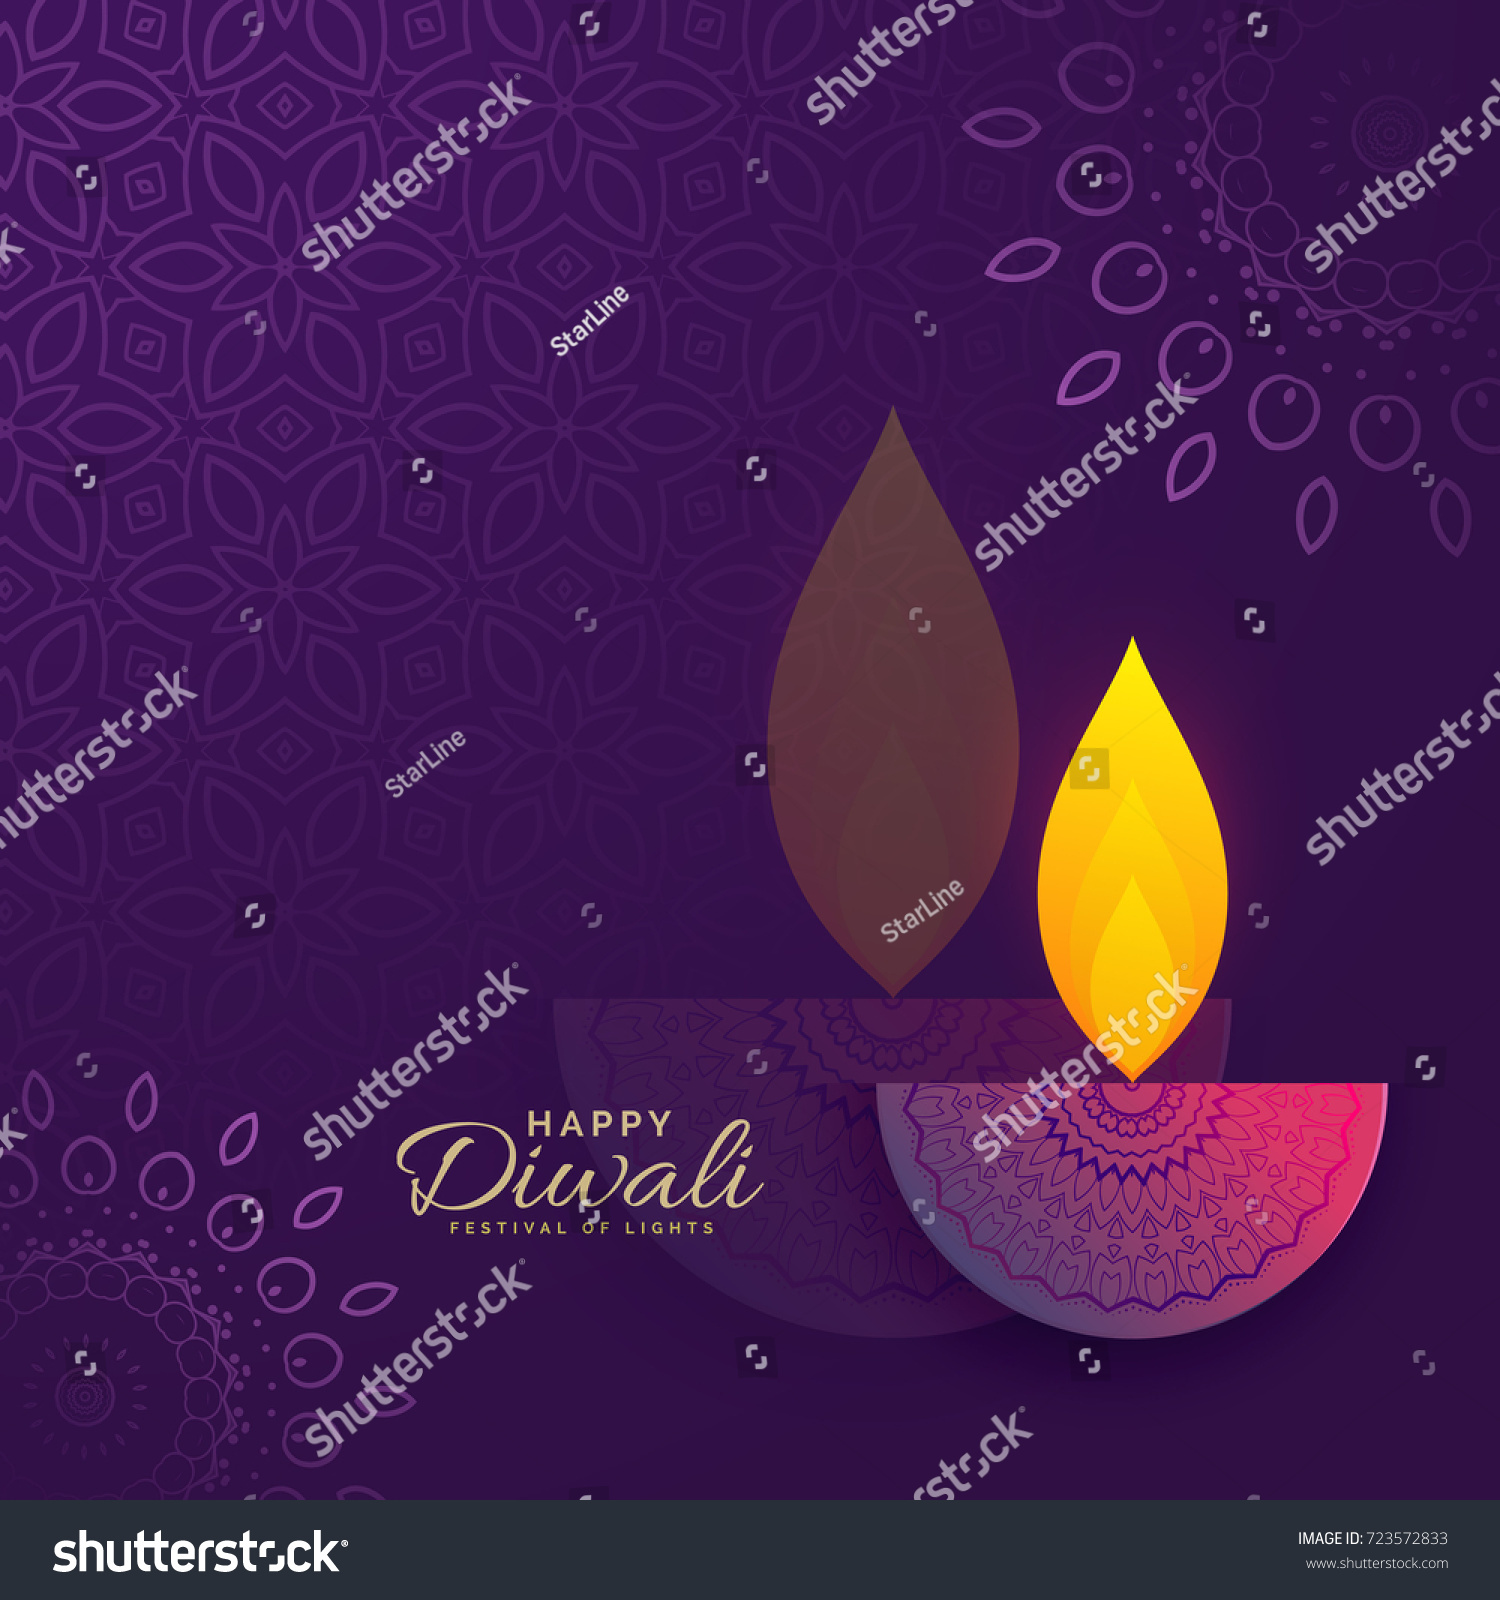 Diwali greeting card design creative diya stock vector 723572833 diwali greeting card design with creative diya and ornament decoration kristyandbryce Choice Image